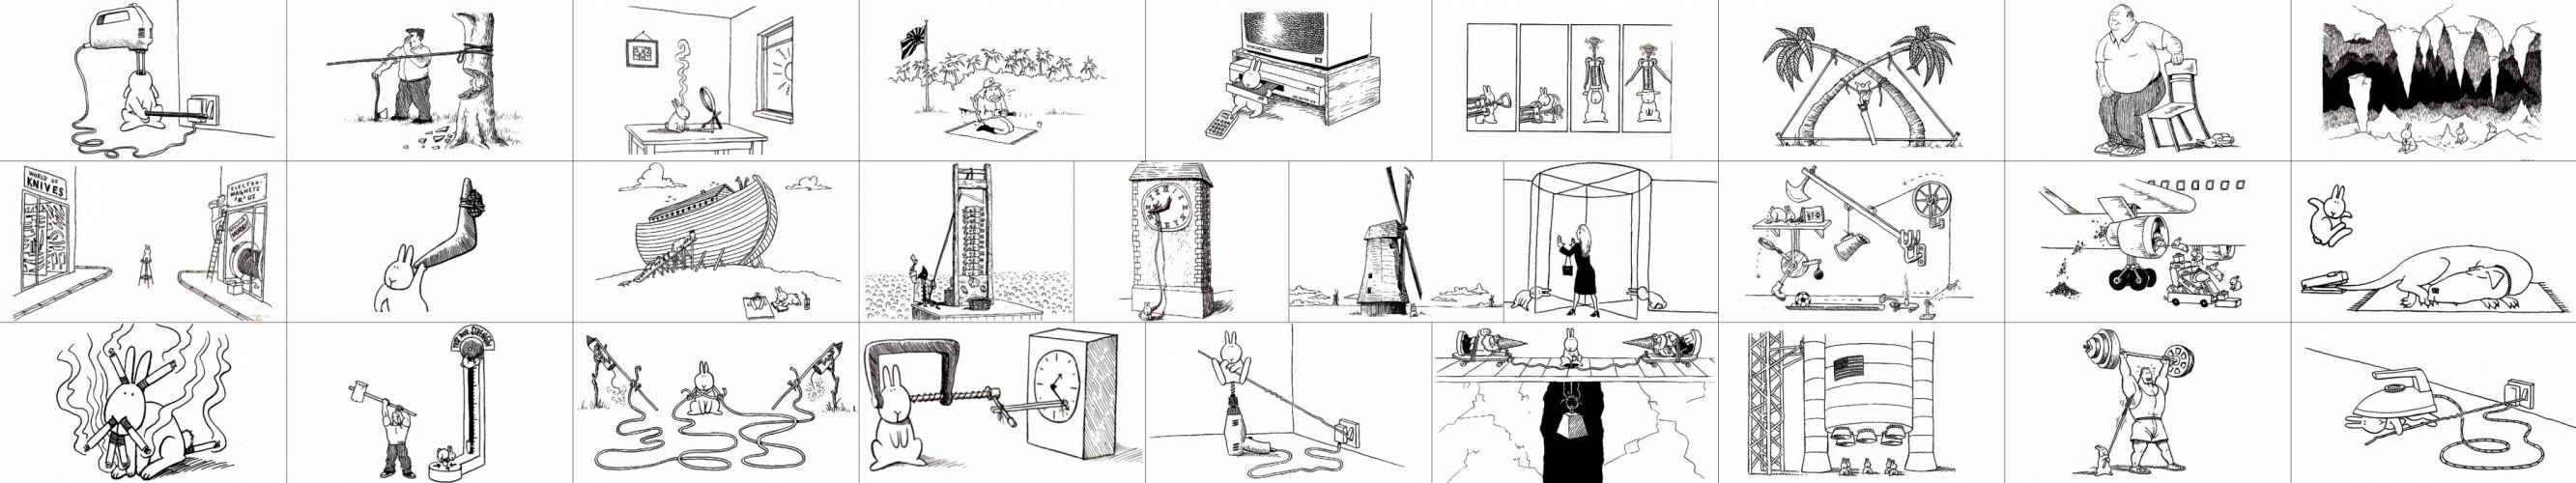 suicide rabbits wallpaper